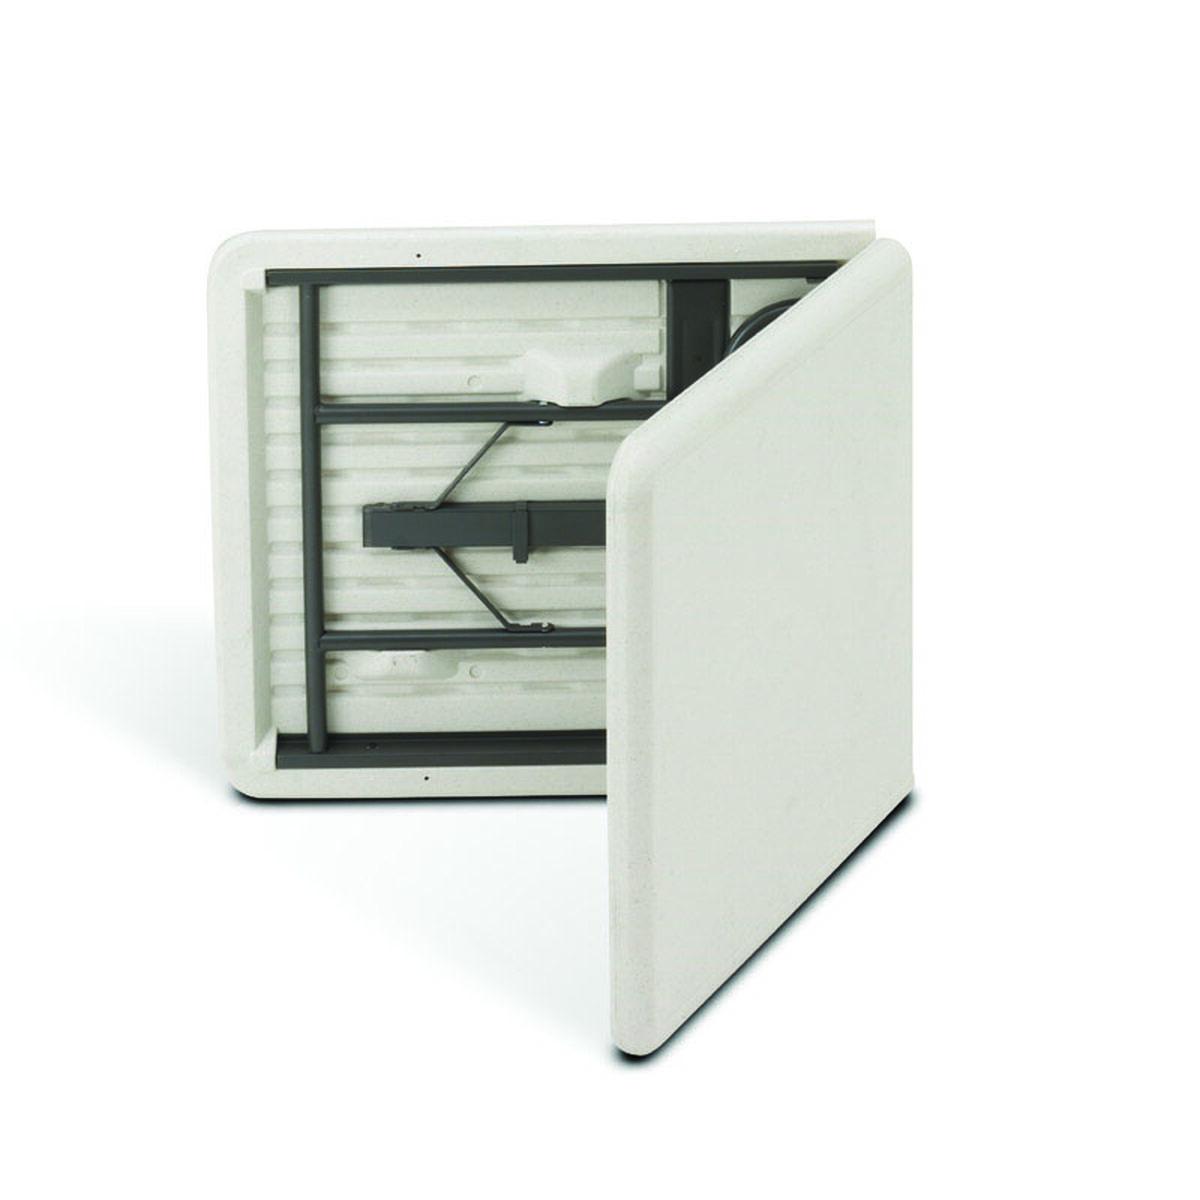 Center folding table plastic 65453 foldingchairs4less our indestructable too 30 w x 60 d bi fold rectangular watchthetrailerfo